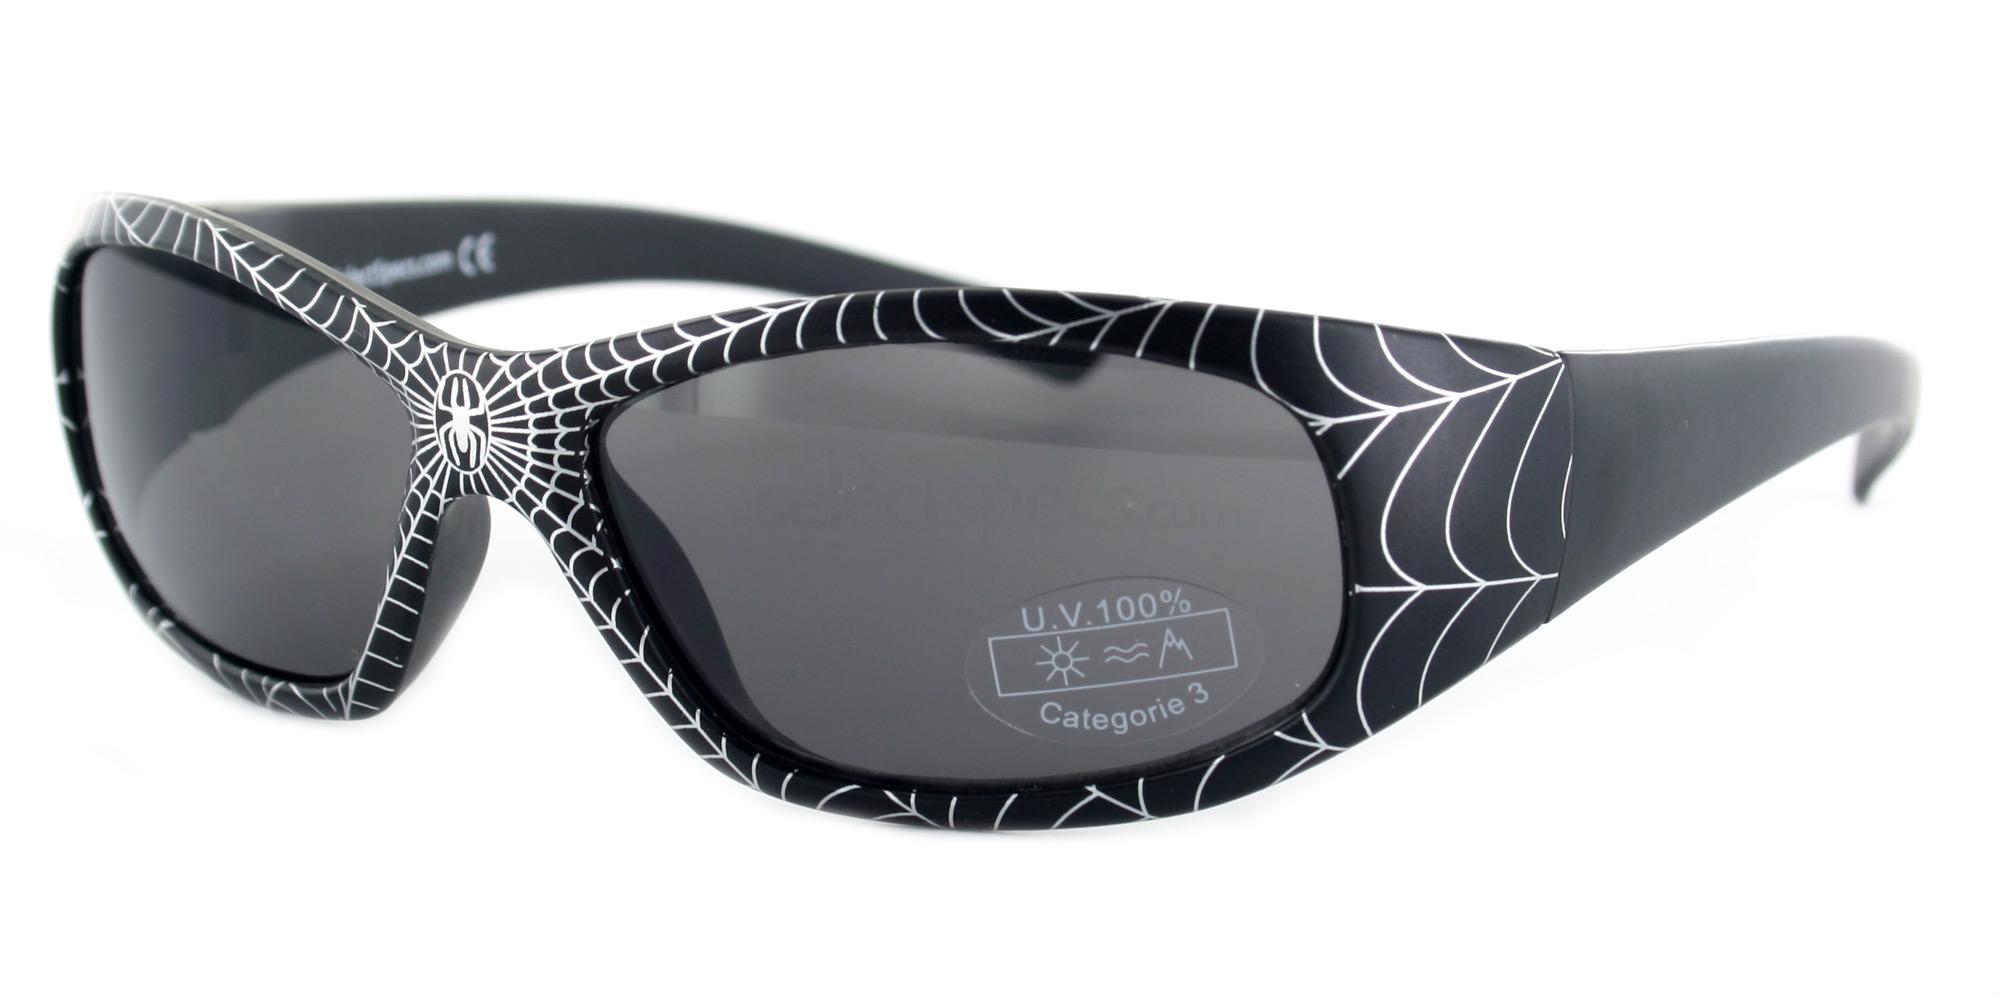 C01 KS02 - Spider-Man Style Sunglasses, Savannah KIDS